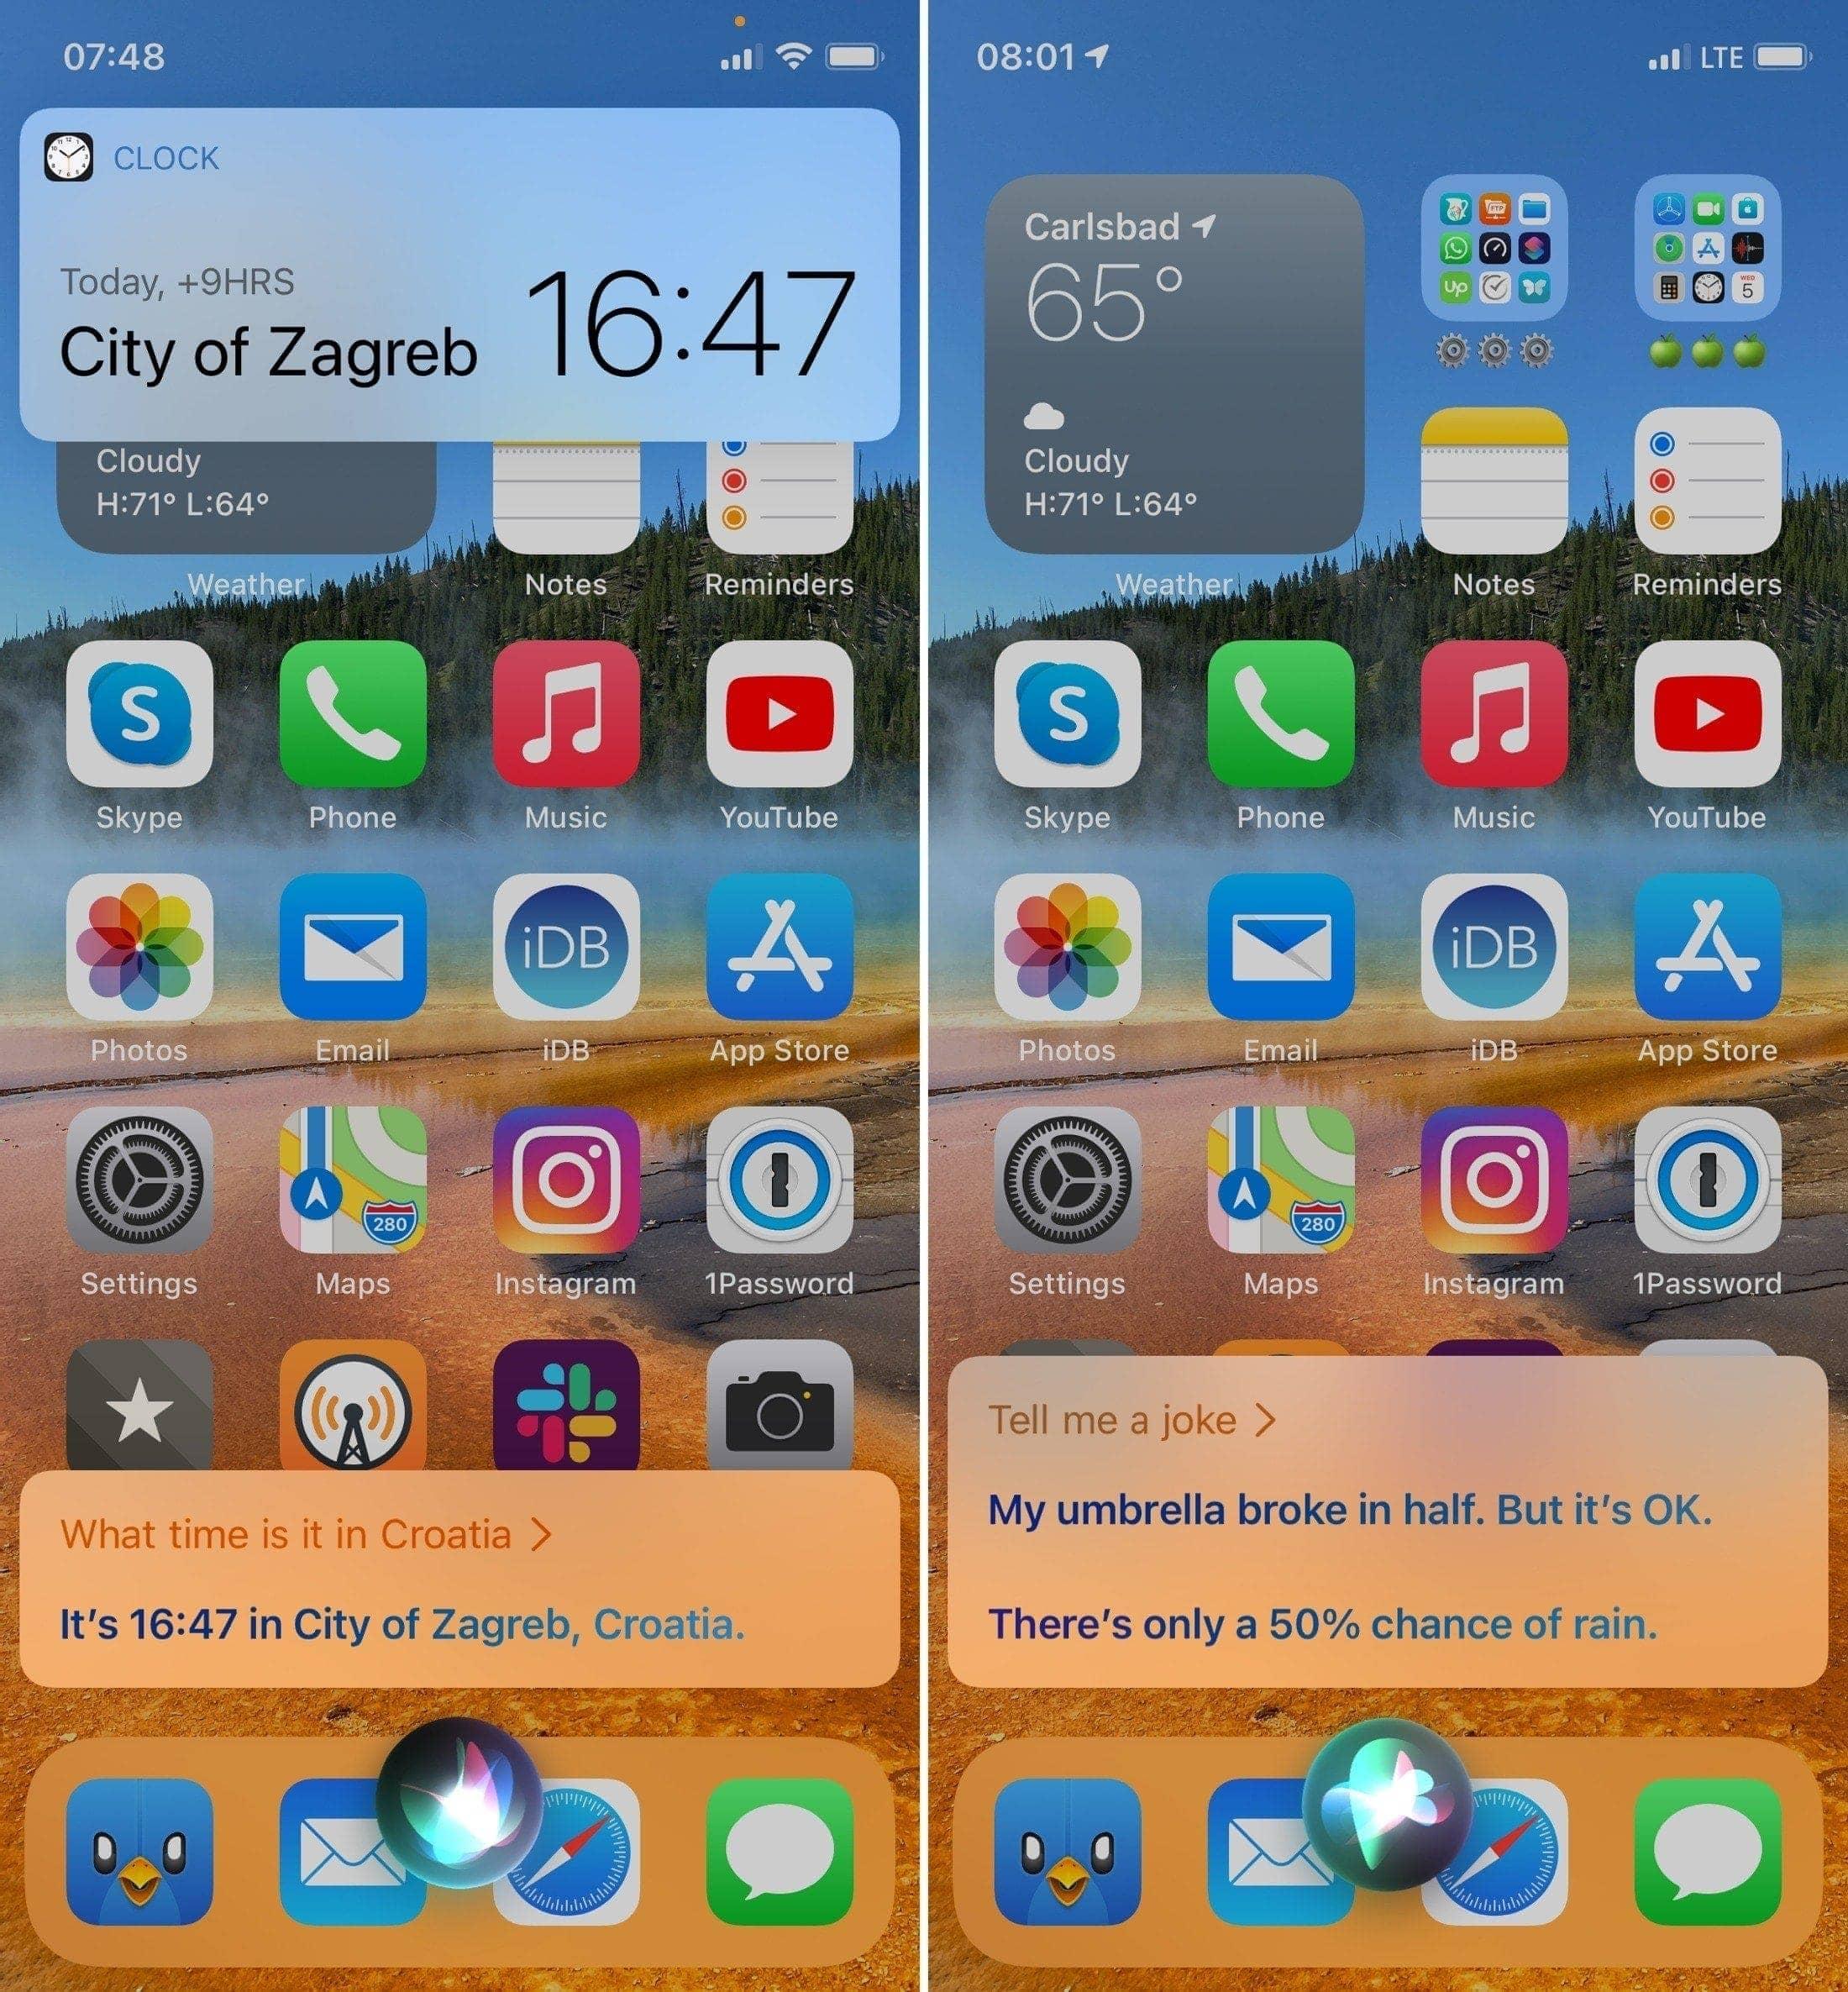 Compact Siri on iPhone